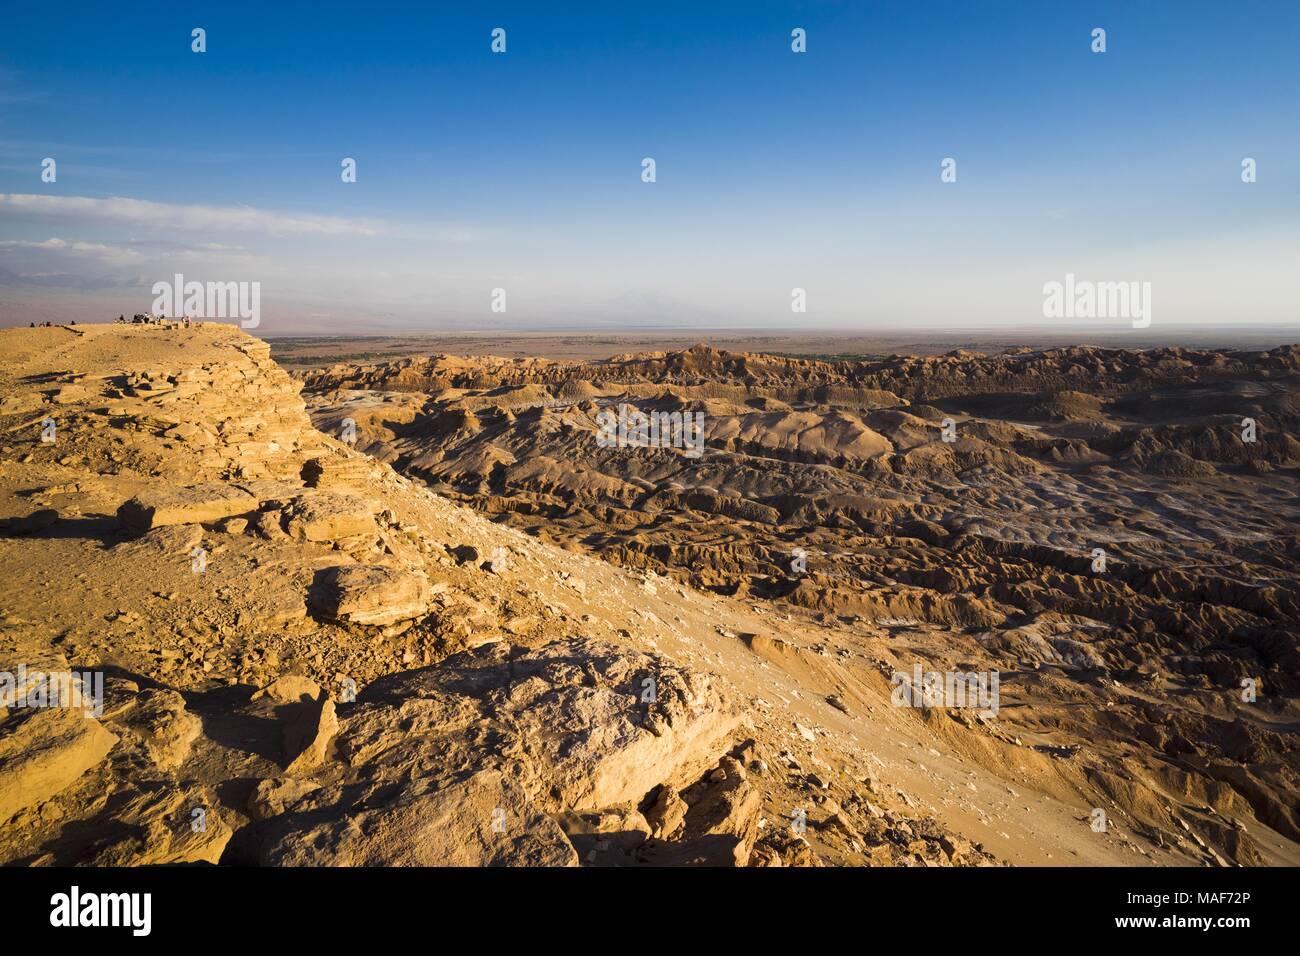 geological rock formations of Valle de la Luna in Atacama desert, Chile - Stock Image